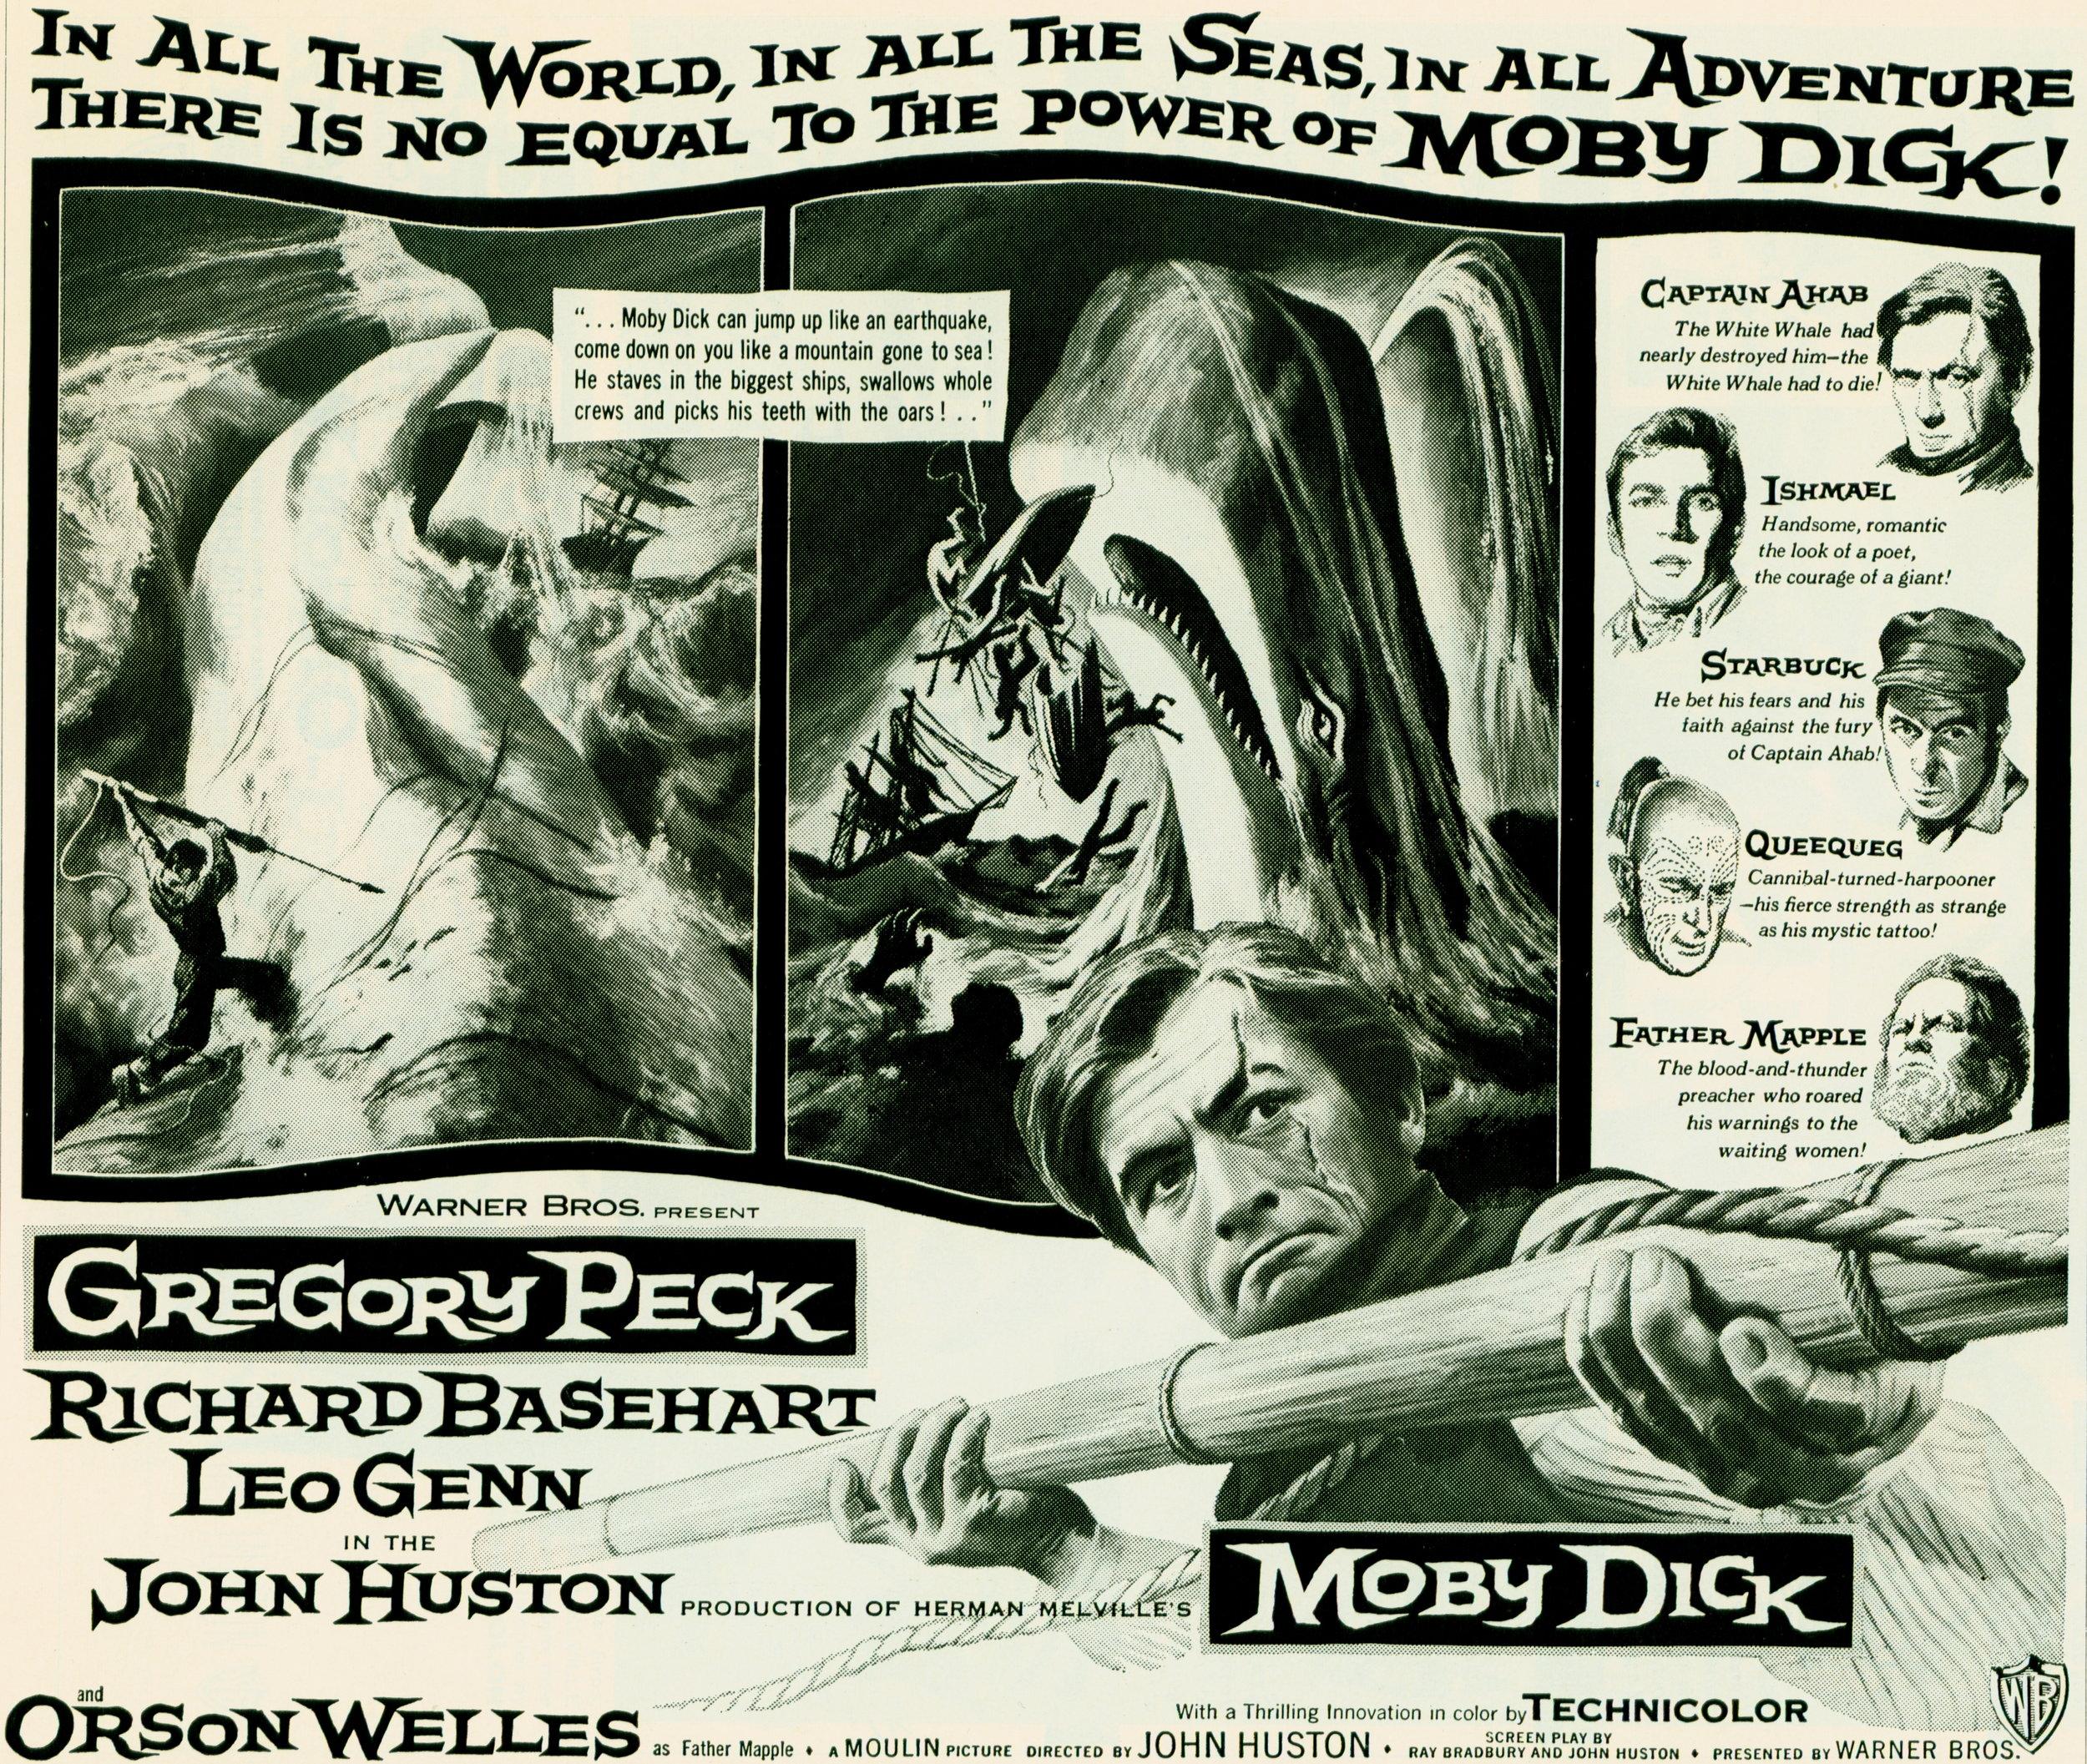 """Moby Dick"" starring Gregory Peck (Warner Bros. Pressbook)"